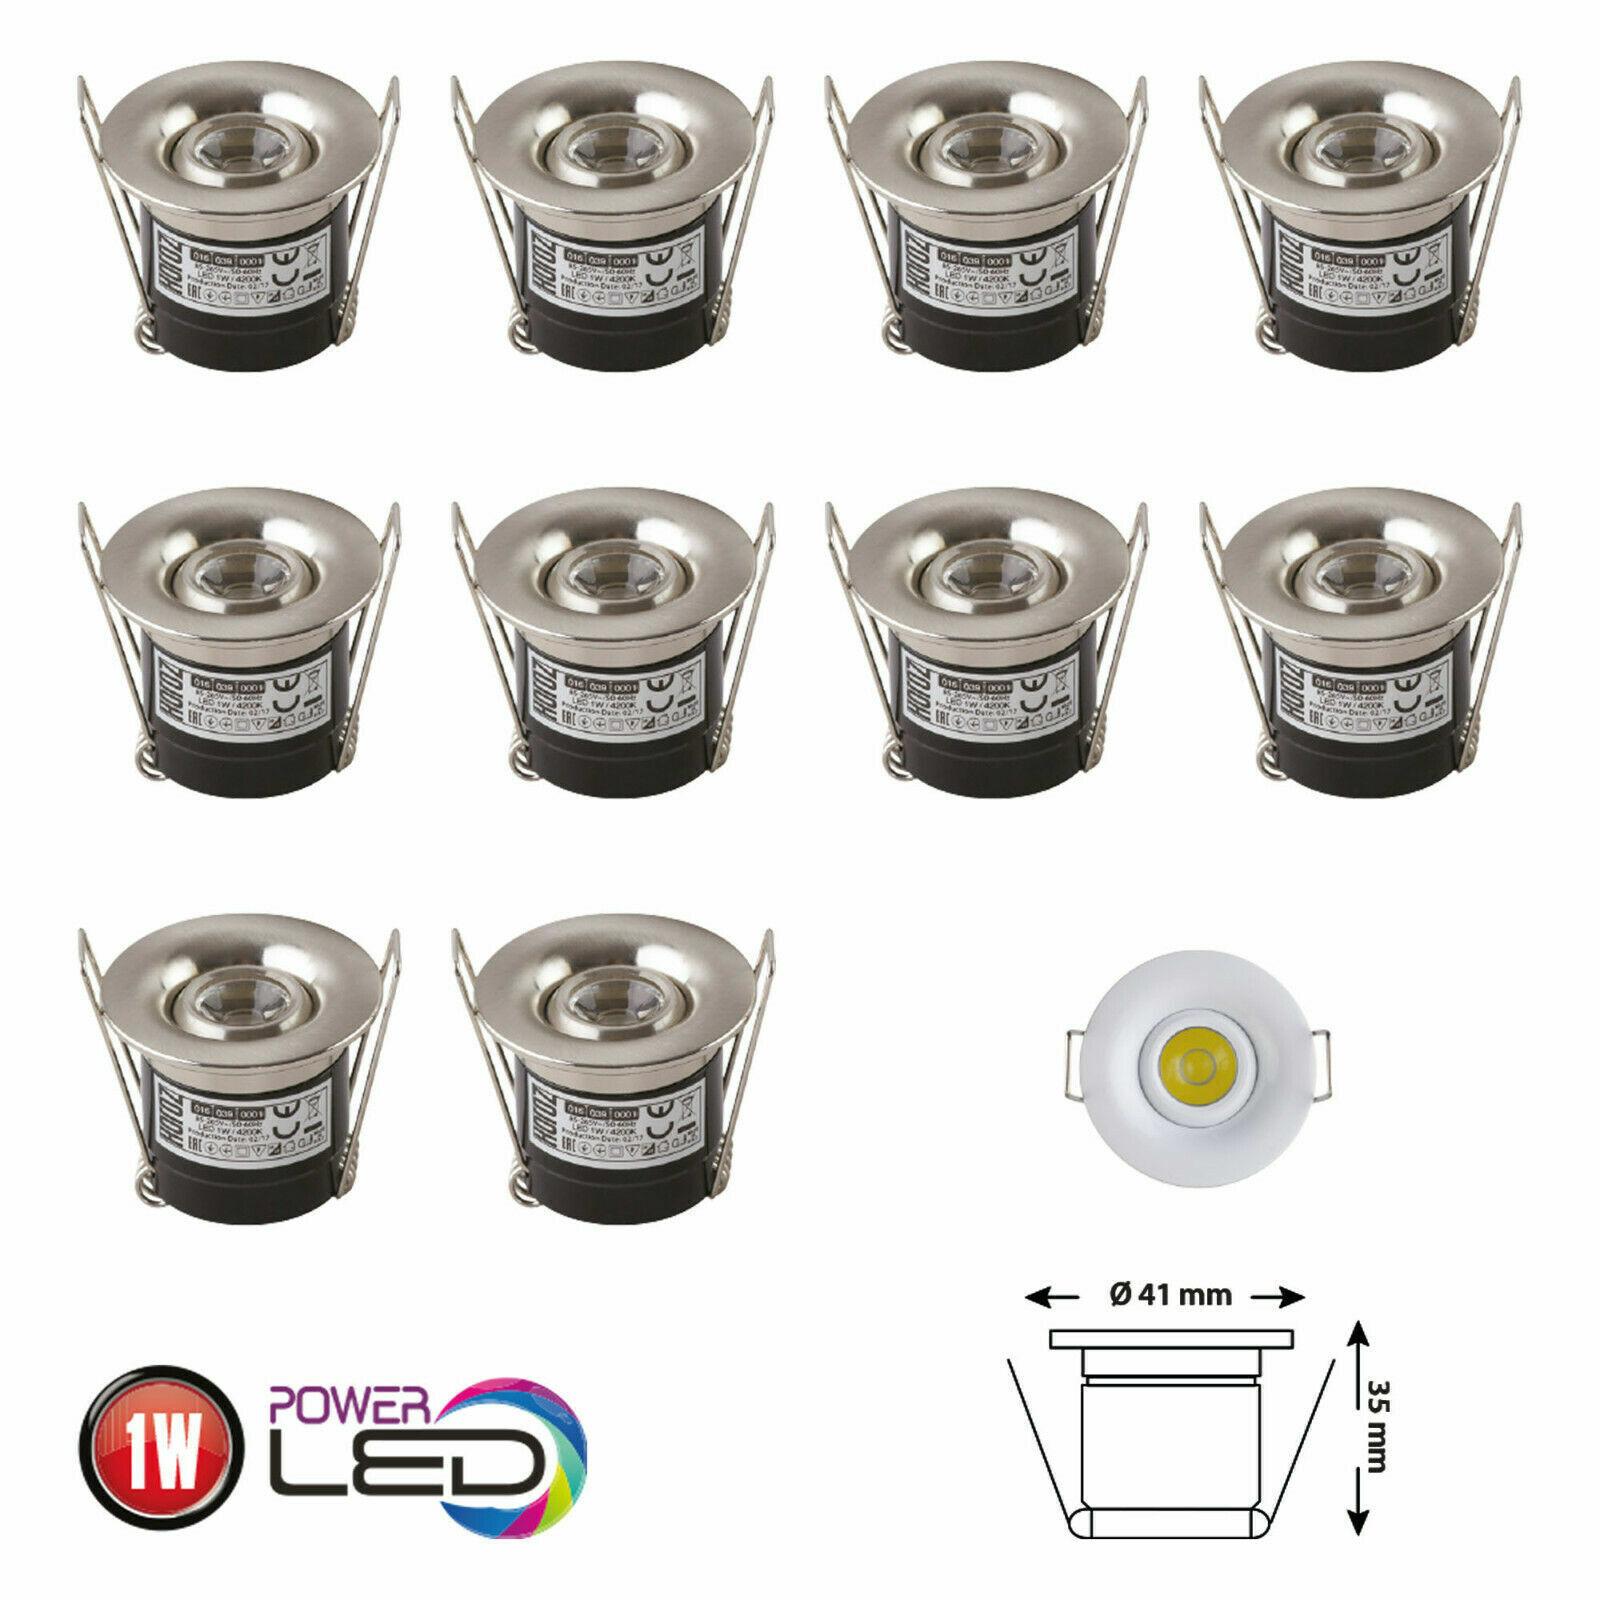 10er Sparset LED Minispot Einbauleuchte EInbaustrahler LED Treppenbeleuchtung 1W